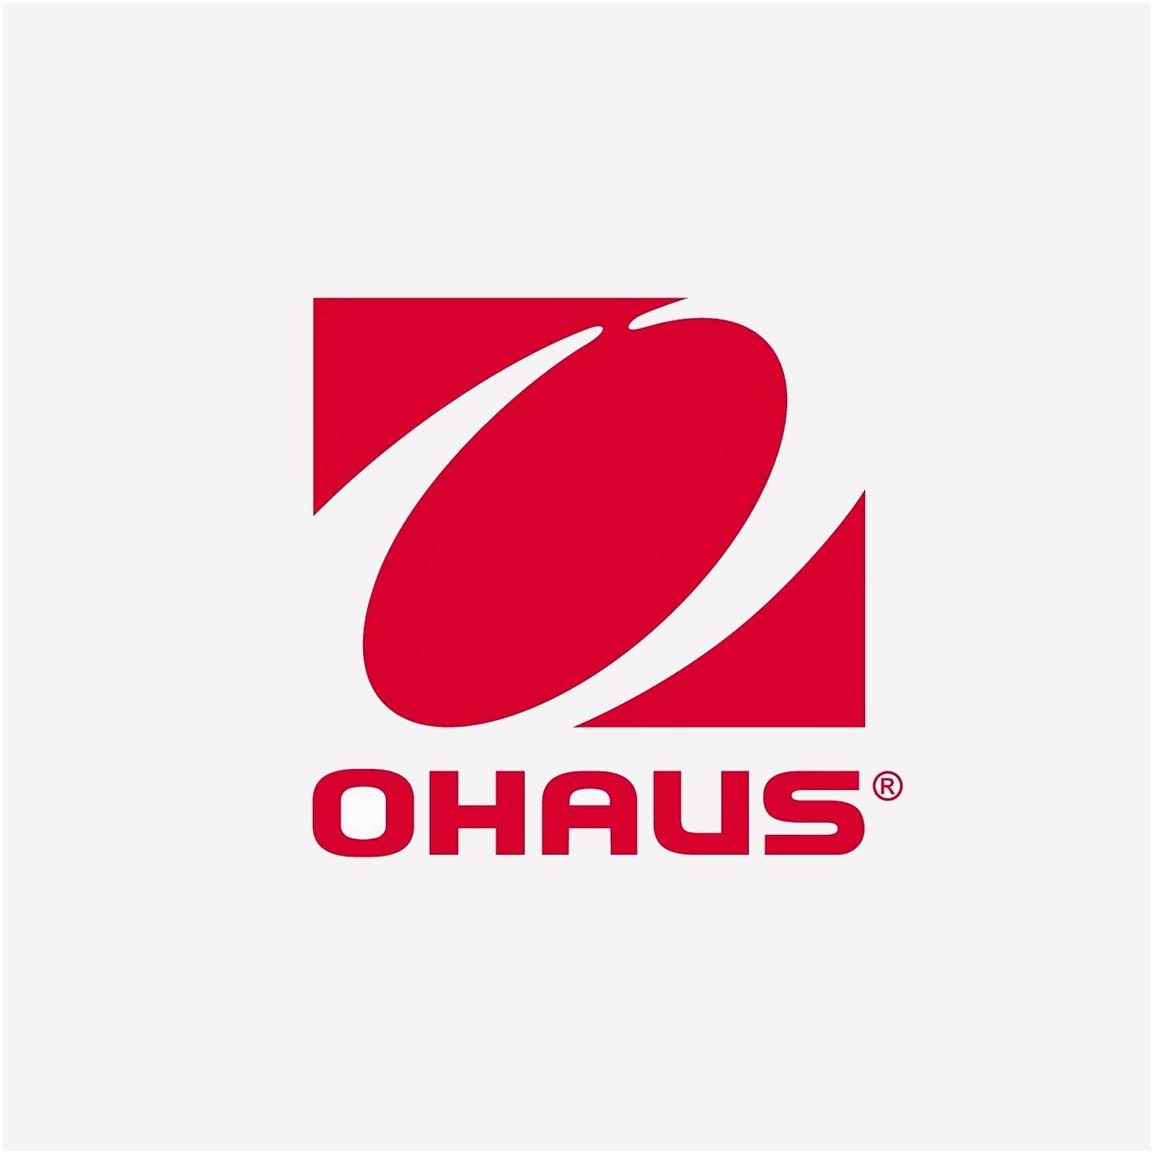 ohaus_logo